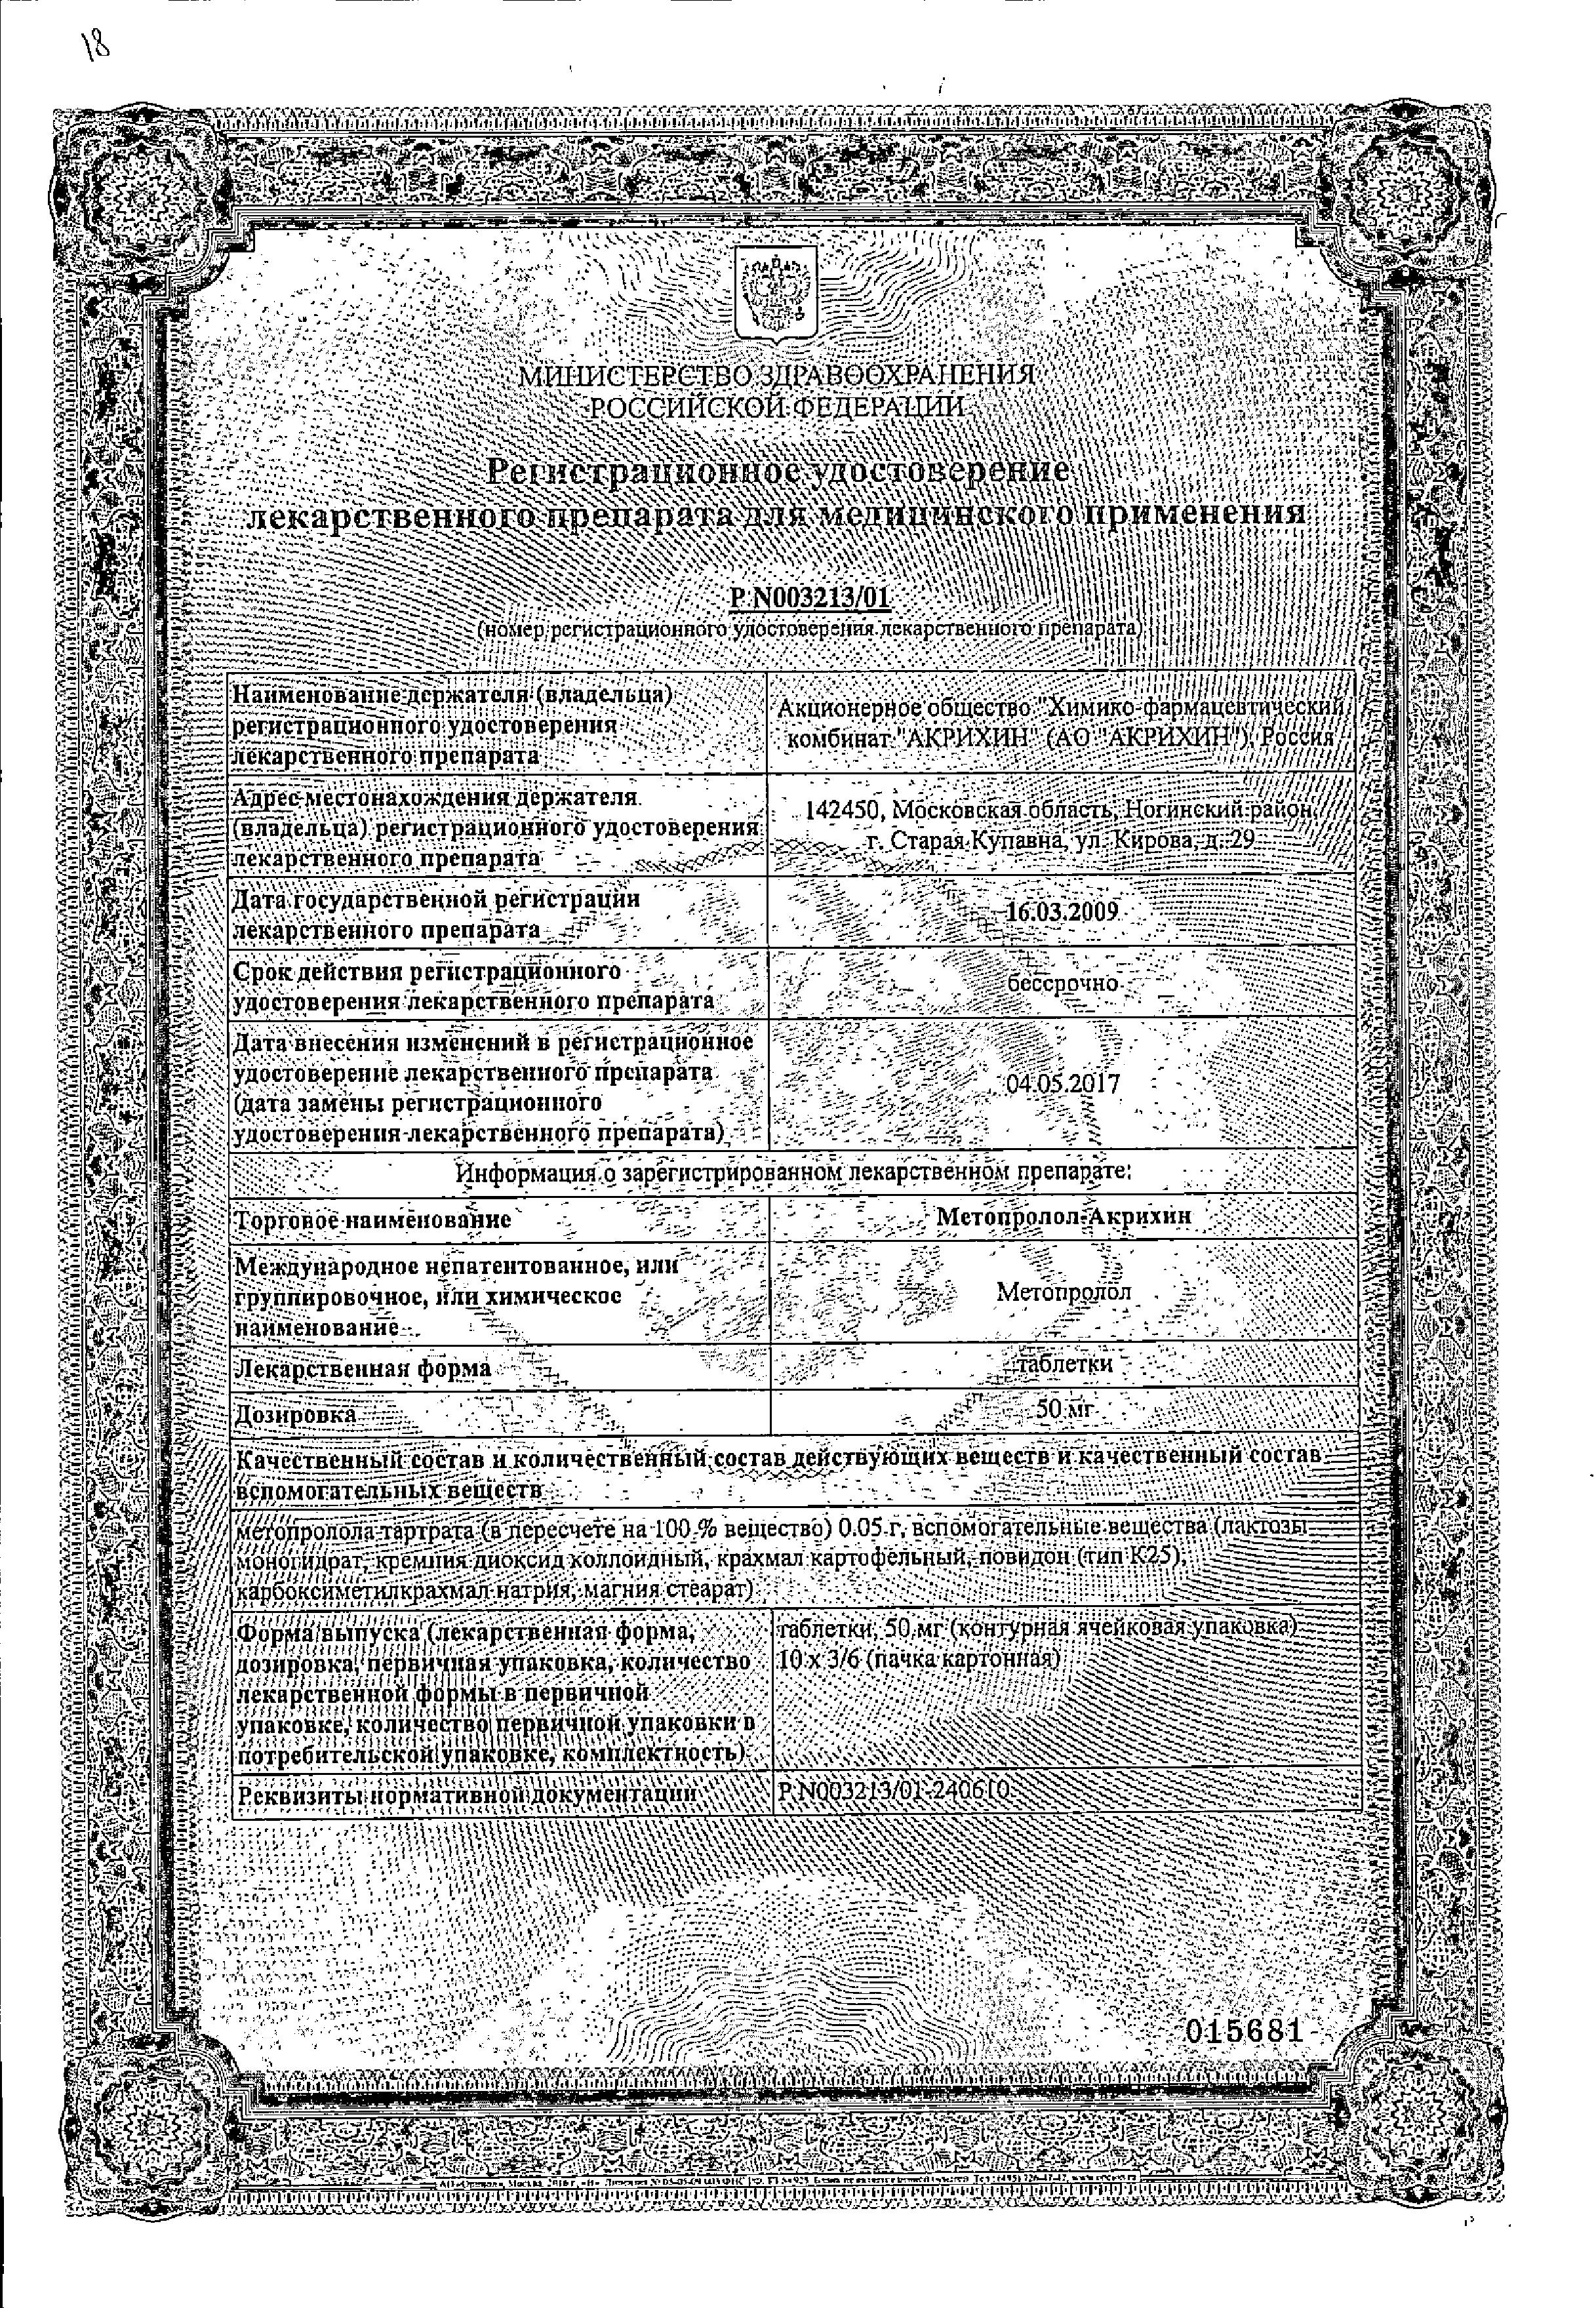 Метопролол-Акрихин сертификат